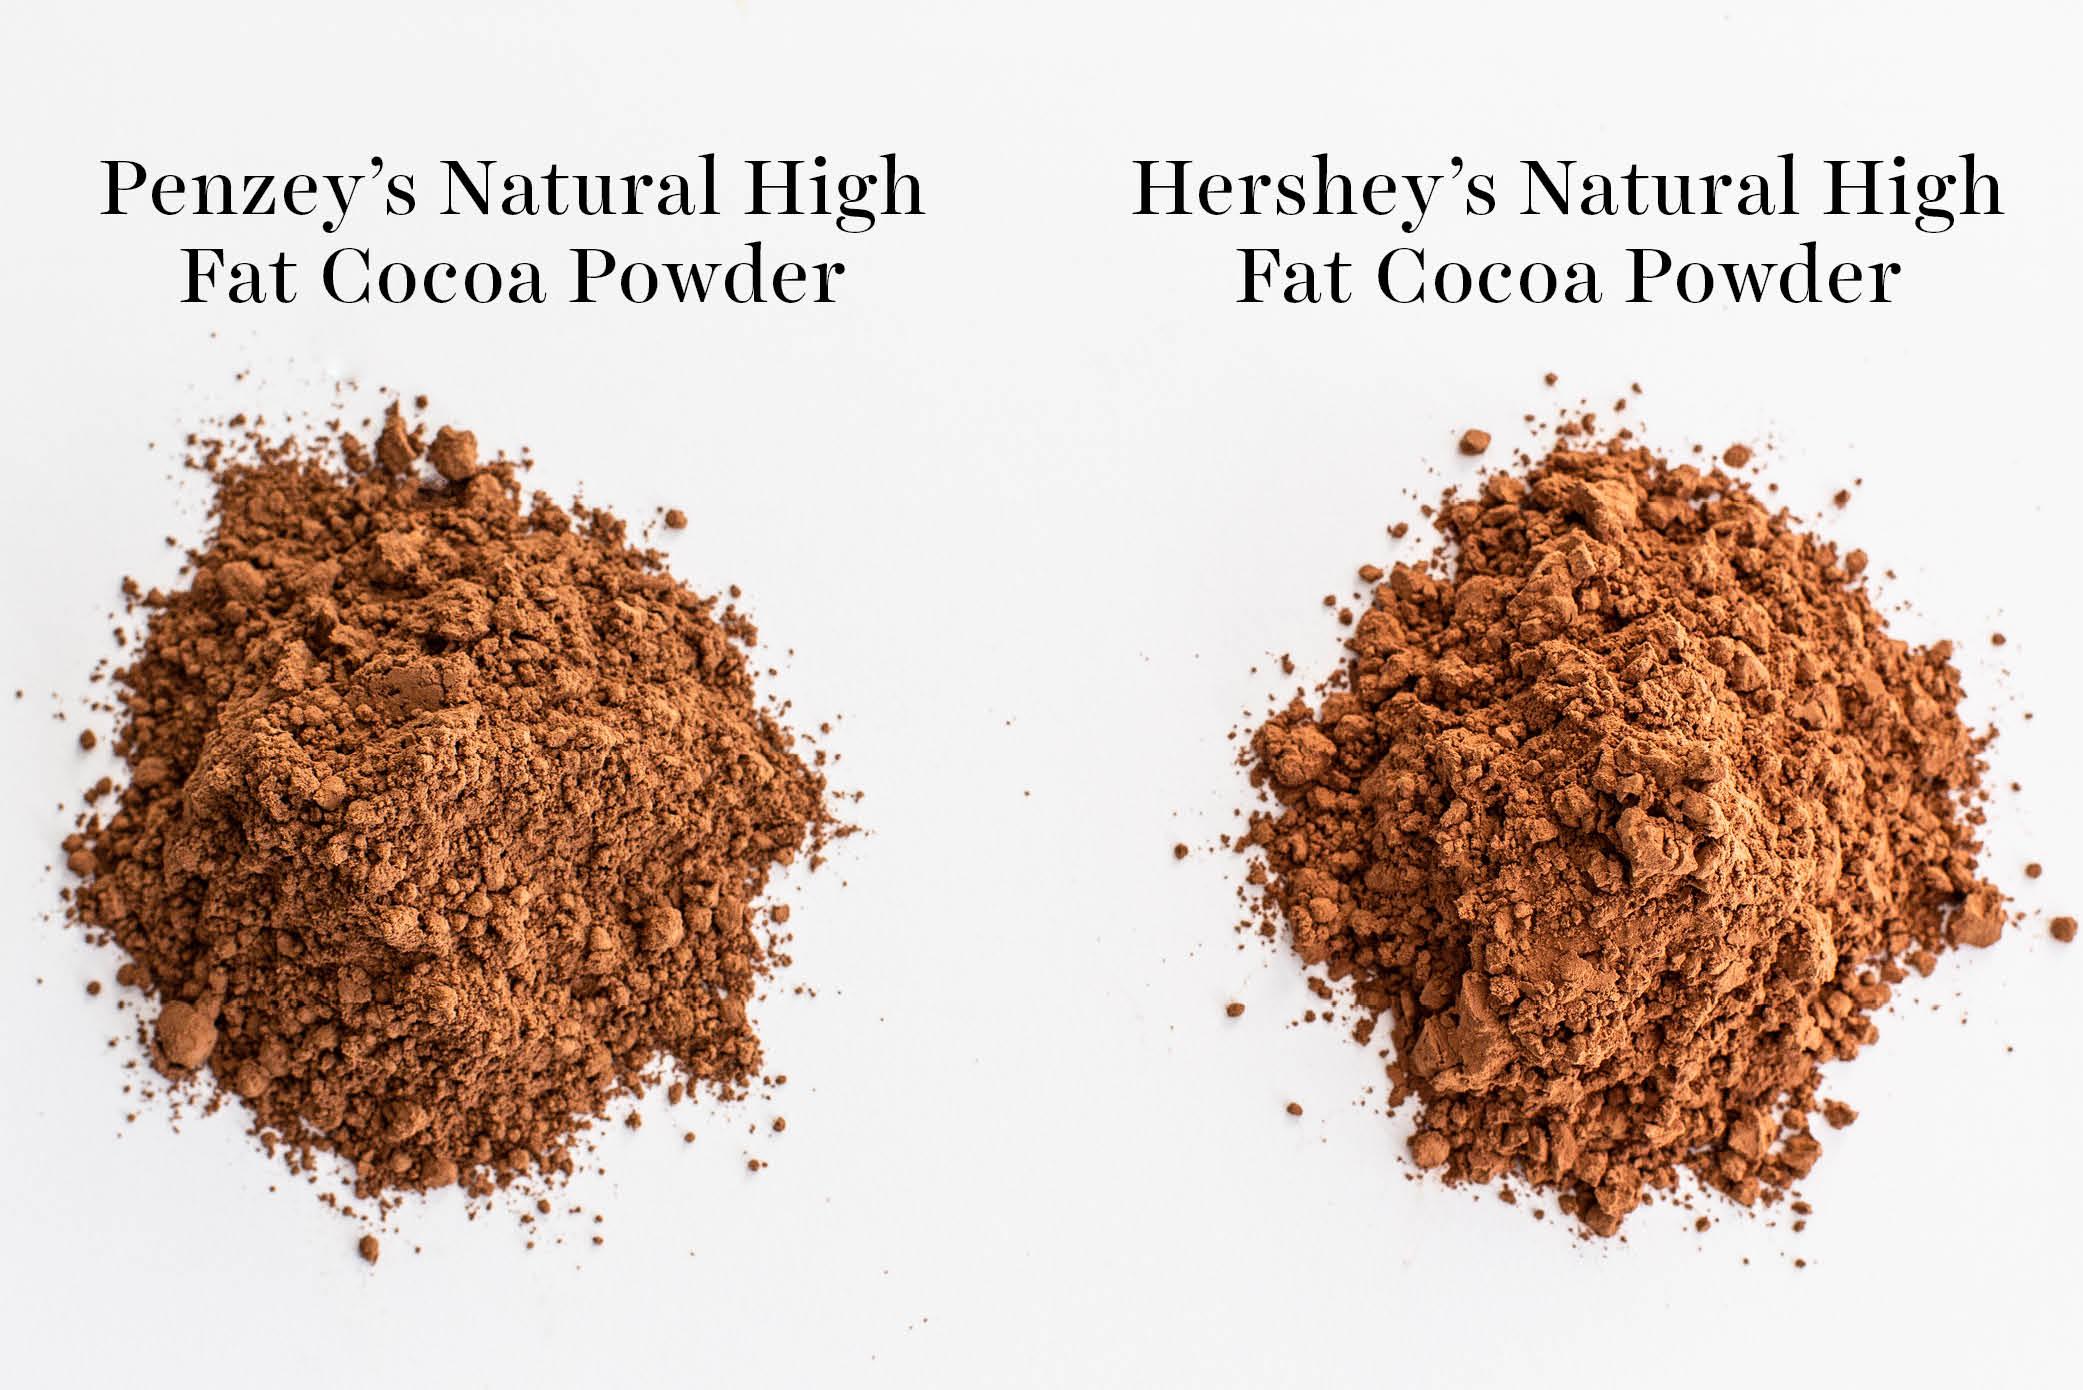 comparison of Penzey's vs Hershey's cocoa powder